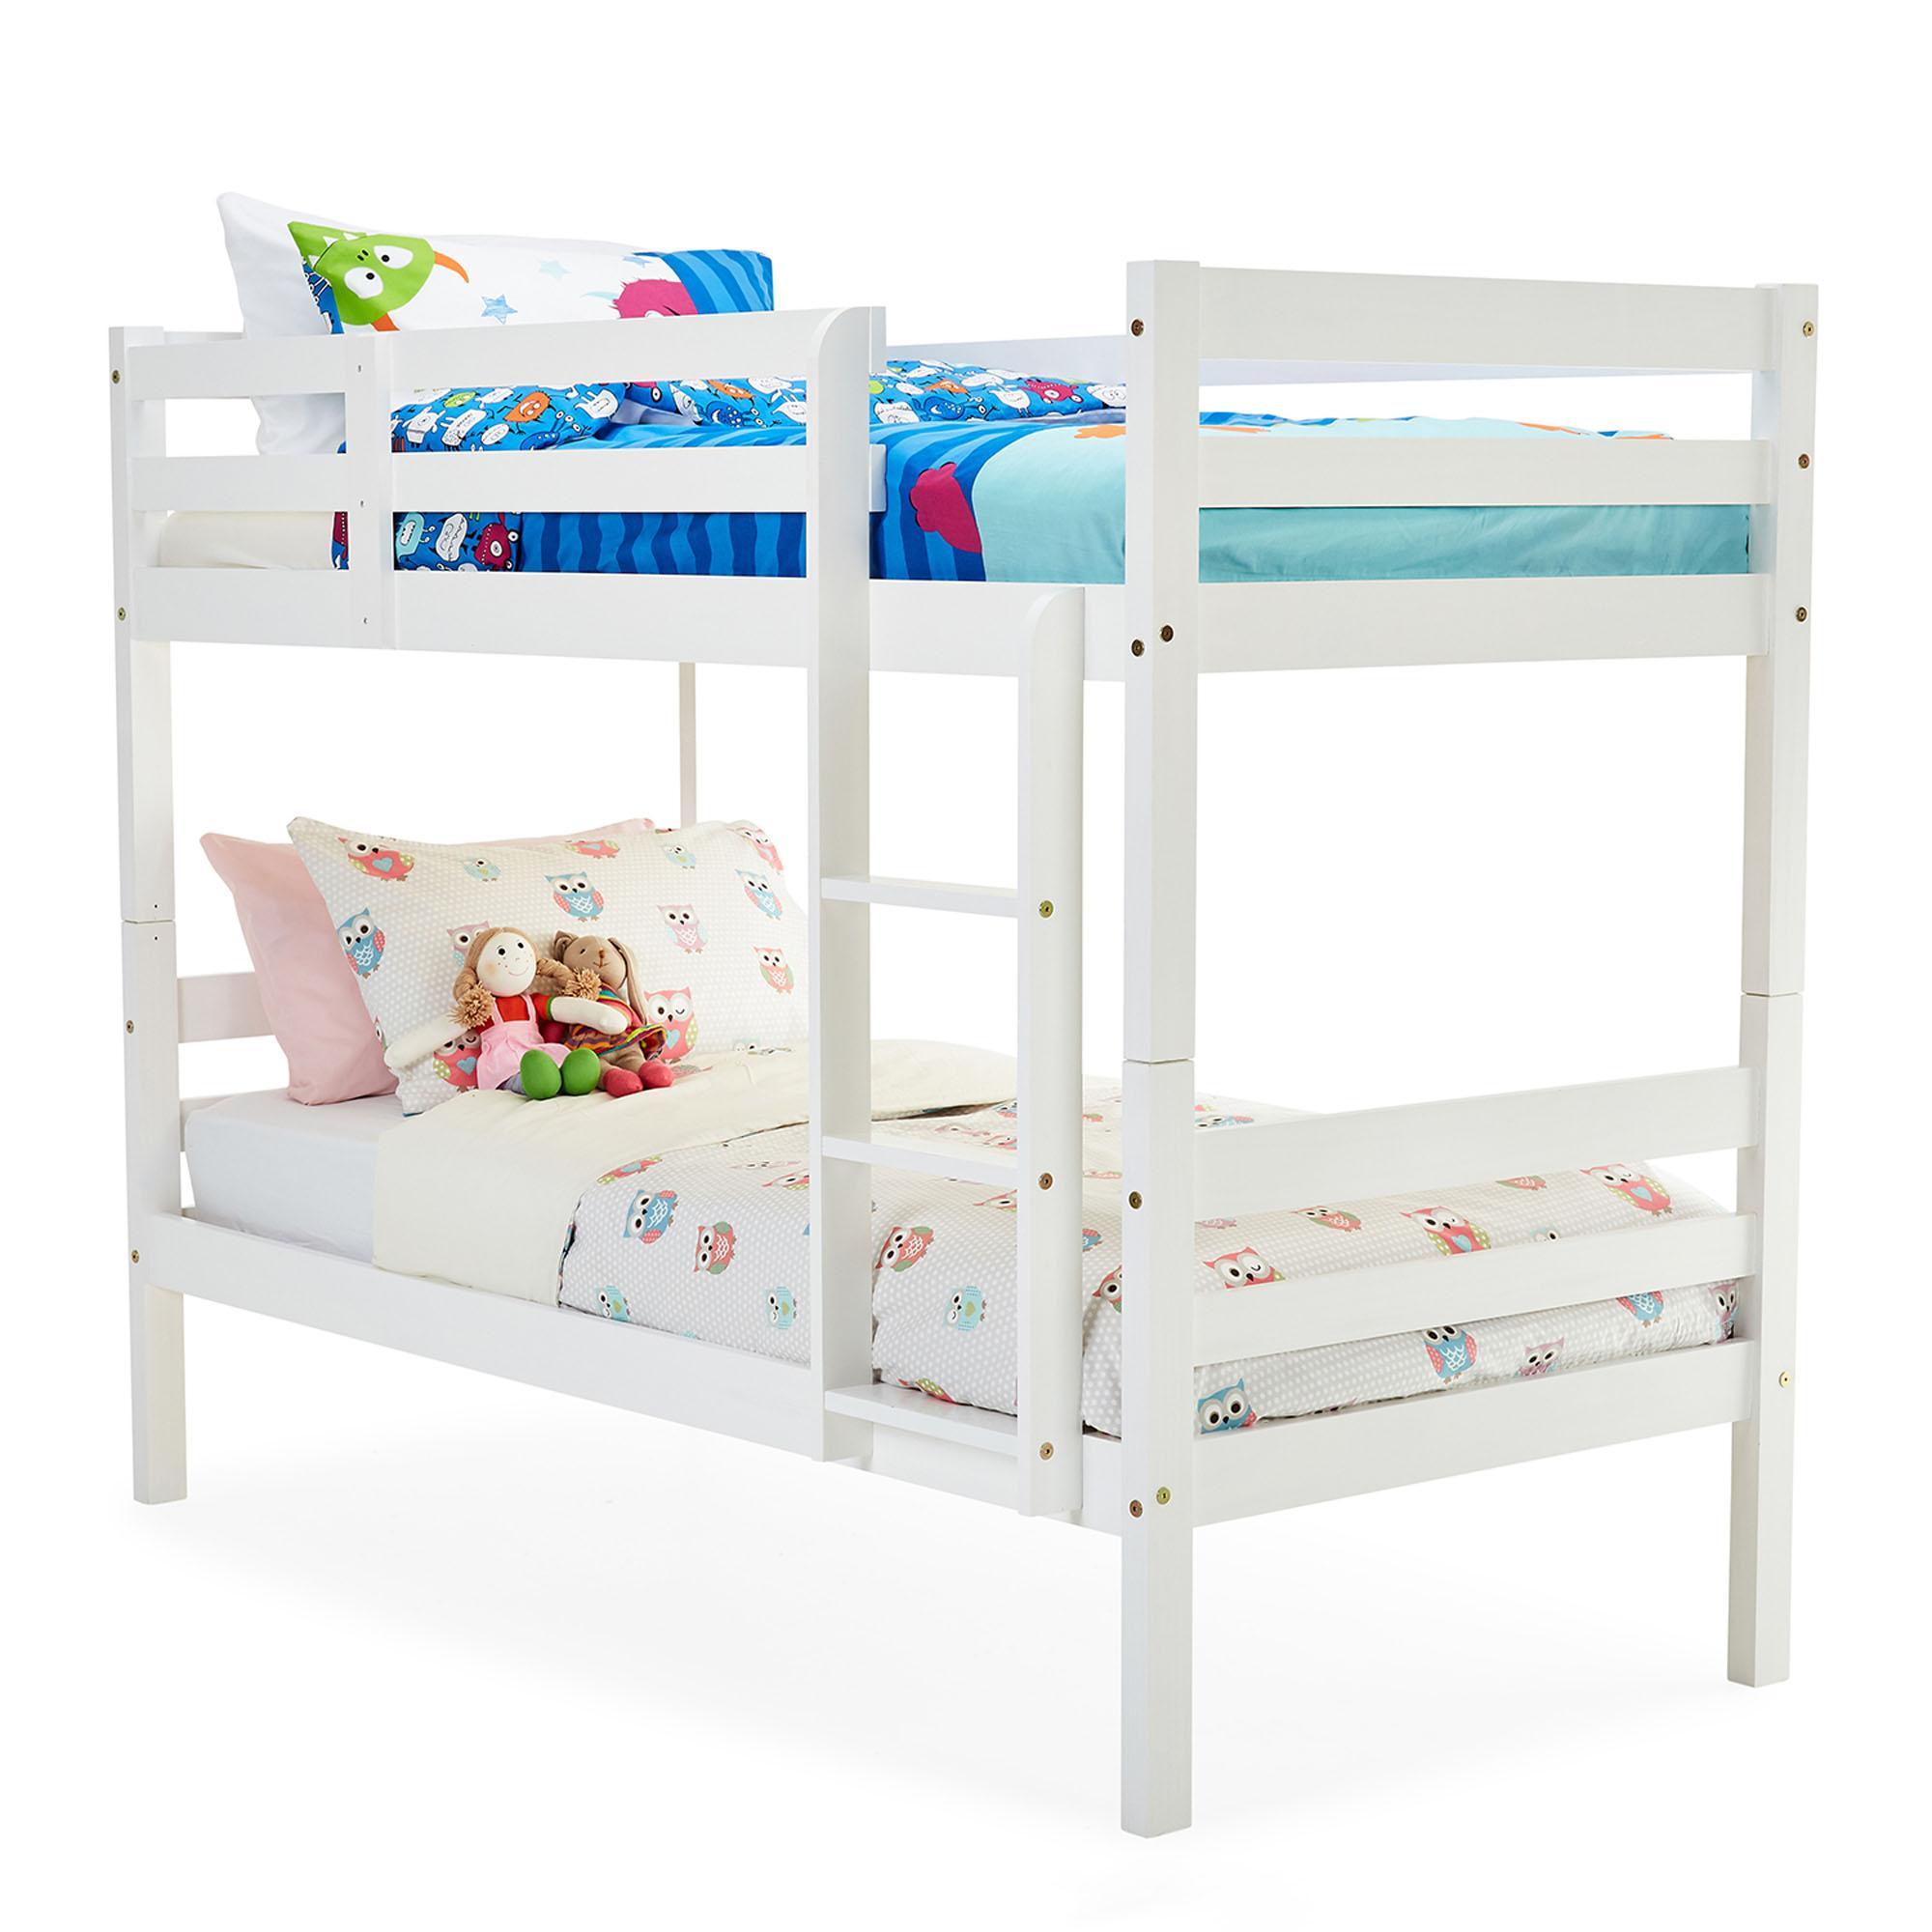 Panama White Bunk Bed